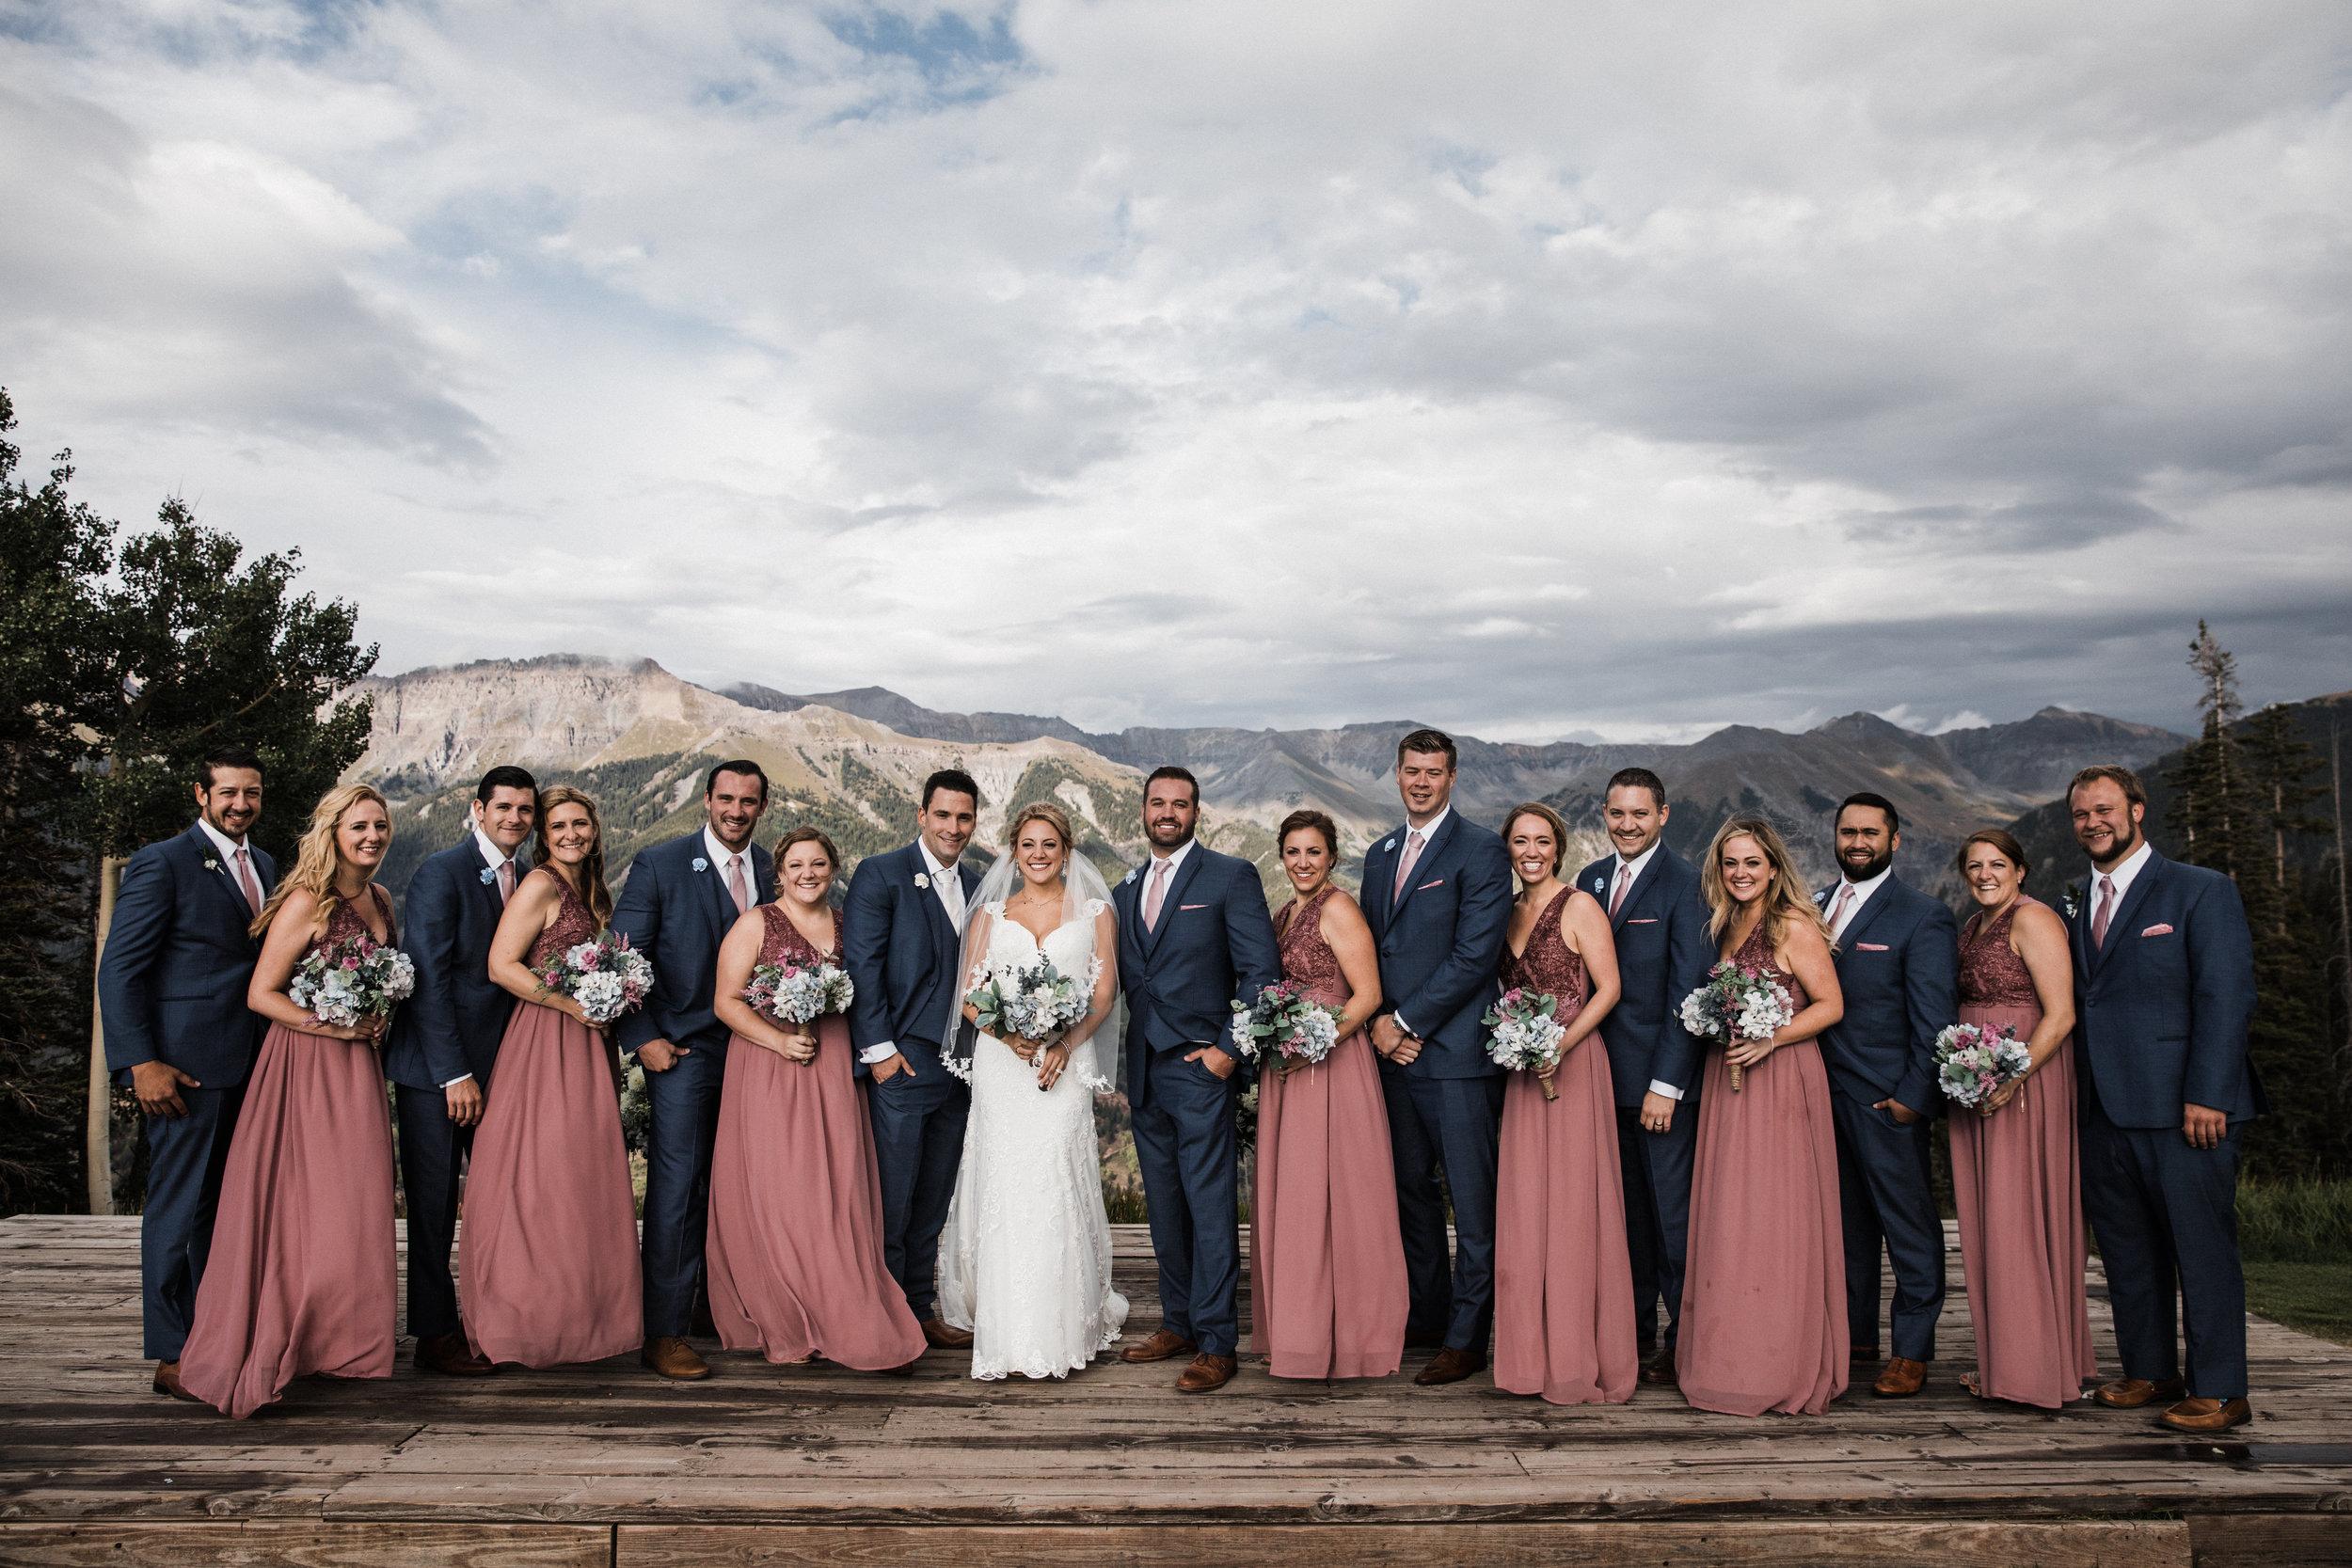 leahandashton-telluride-wedding-photography-0065.jpg